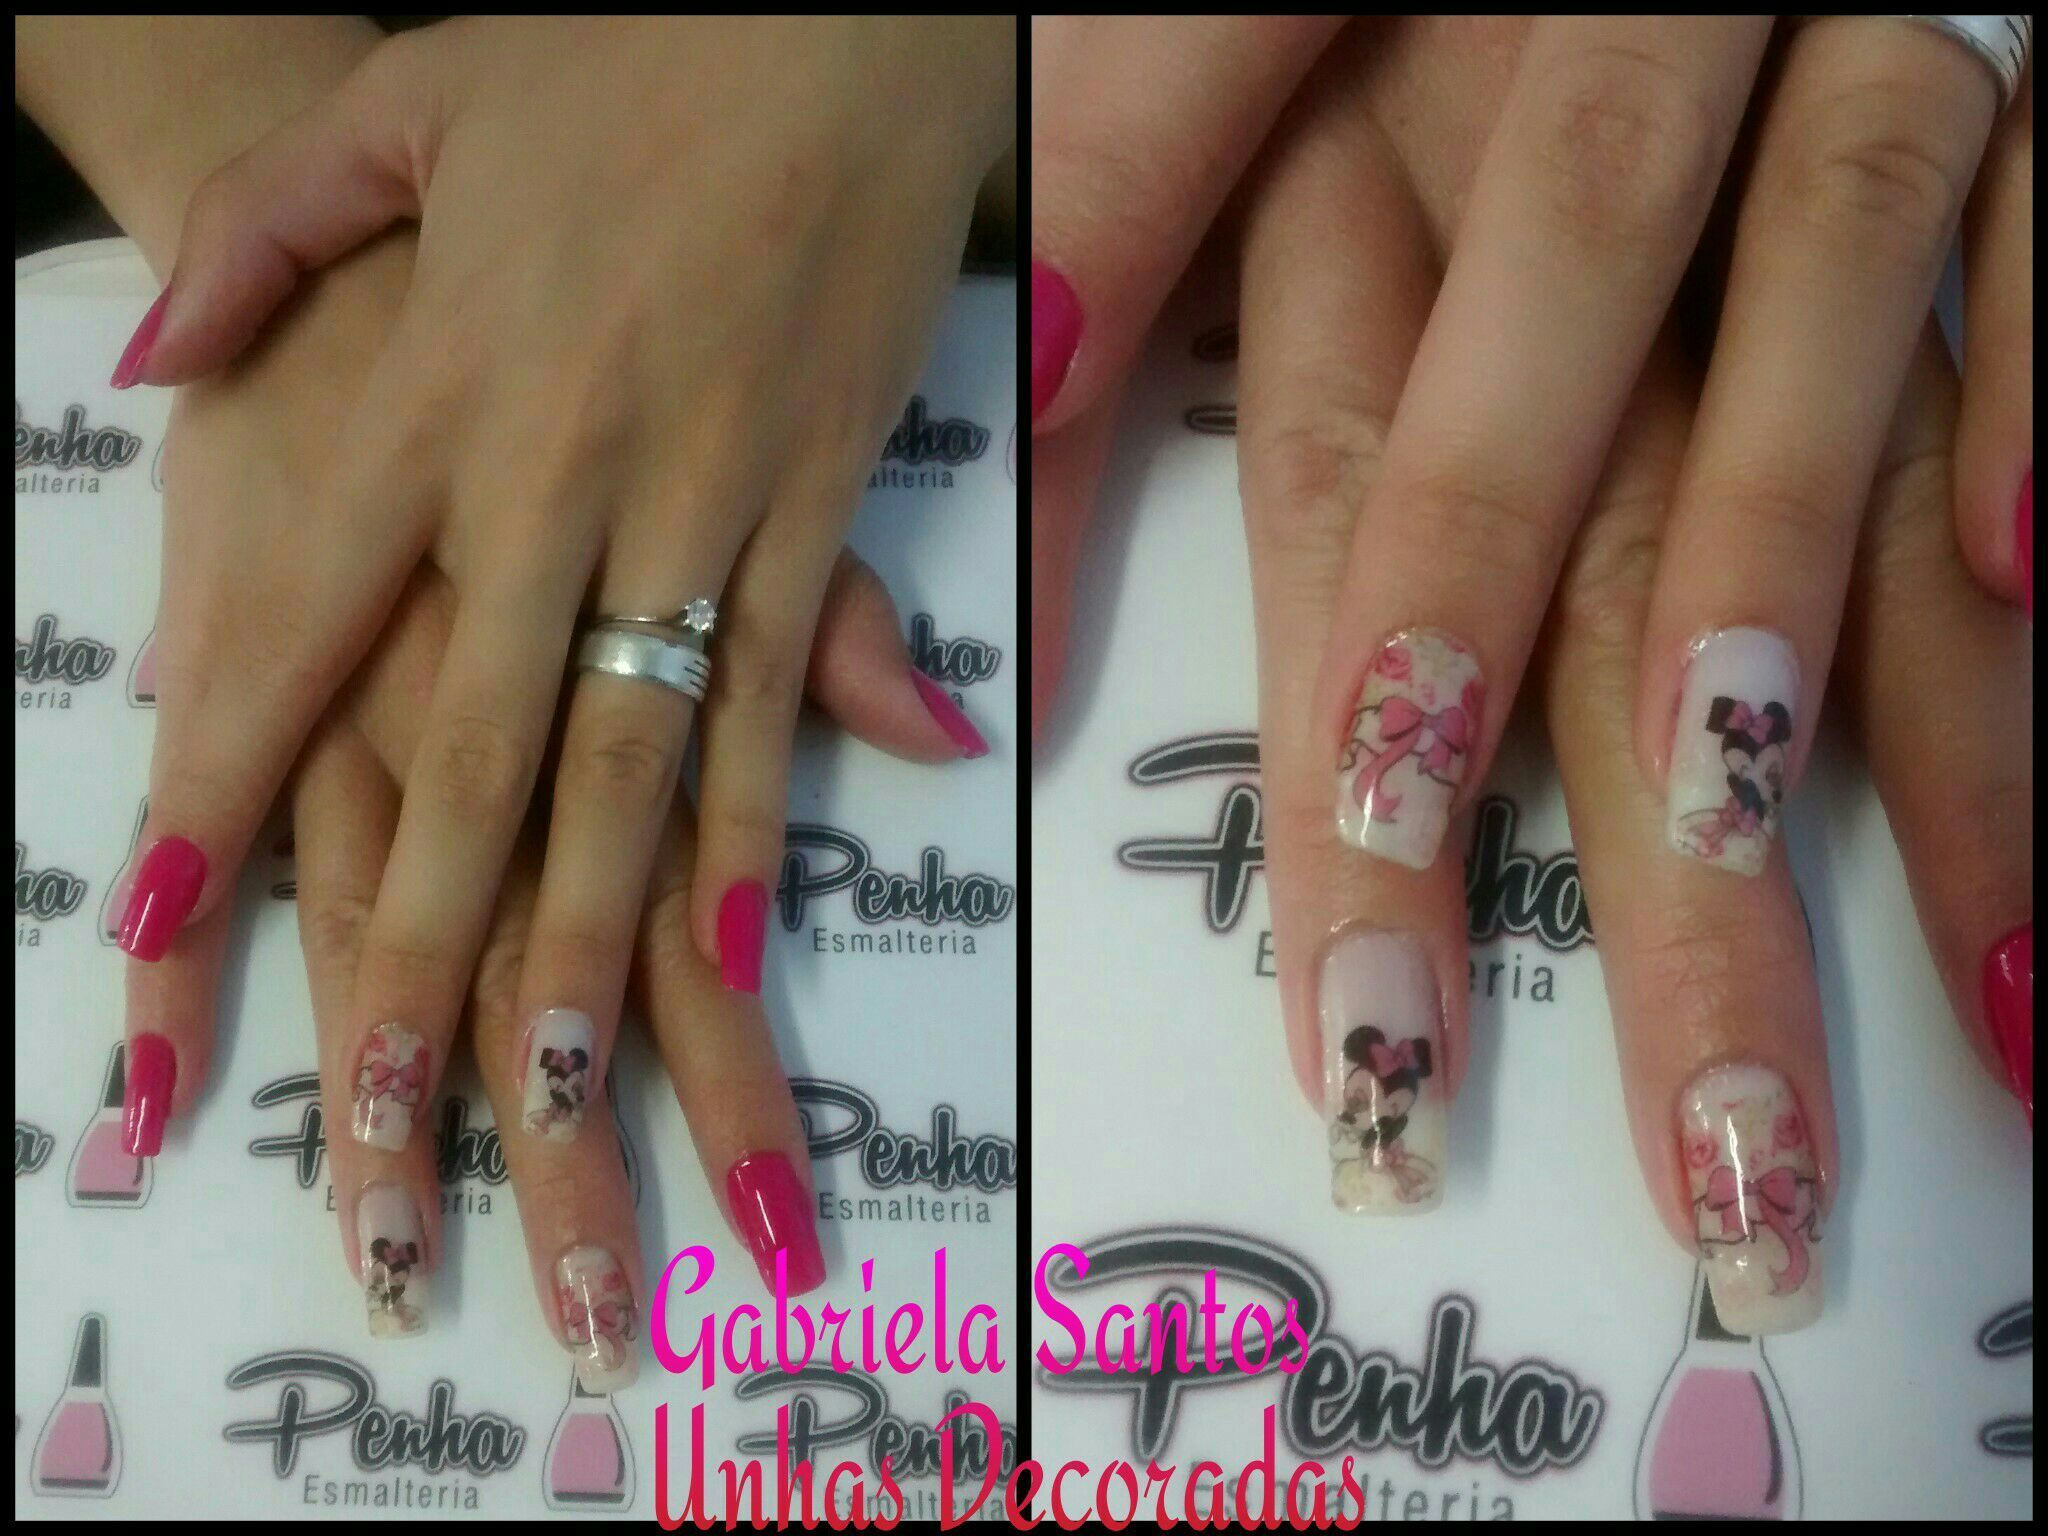 #UunhasDecoradas #Pelicula #Minnie #NailArt #Esmalte  #GabrielaSantosUnhasDecoradas manicure e pedicure